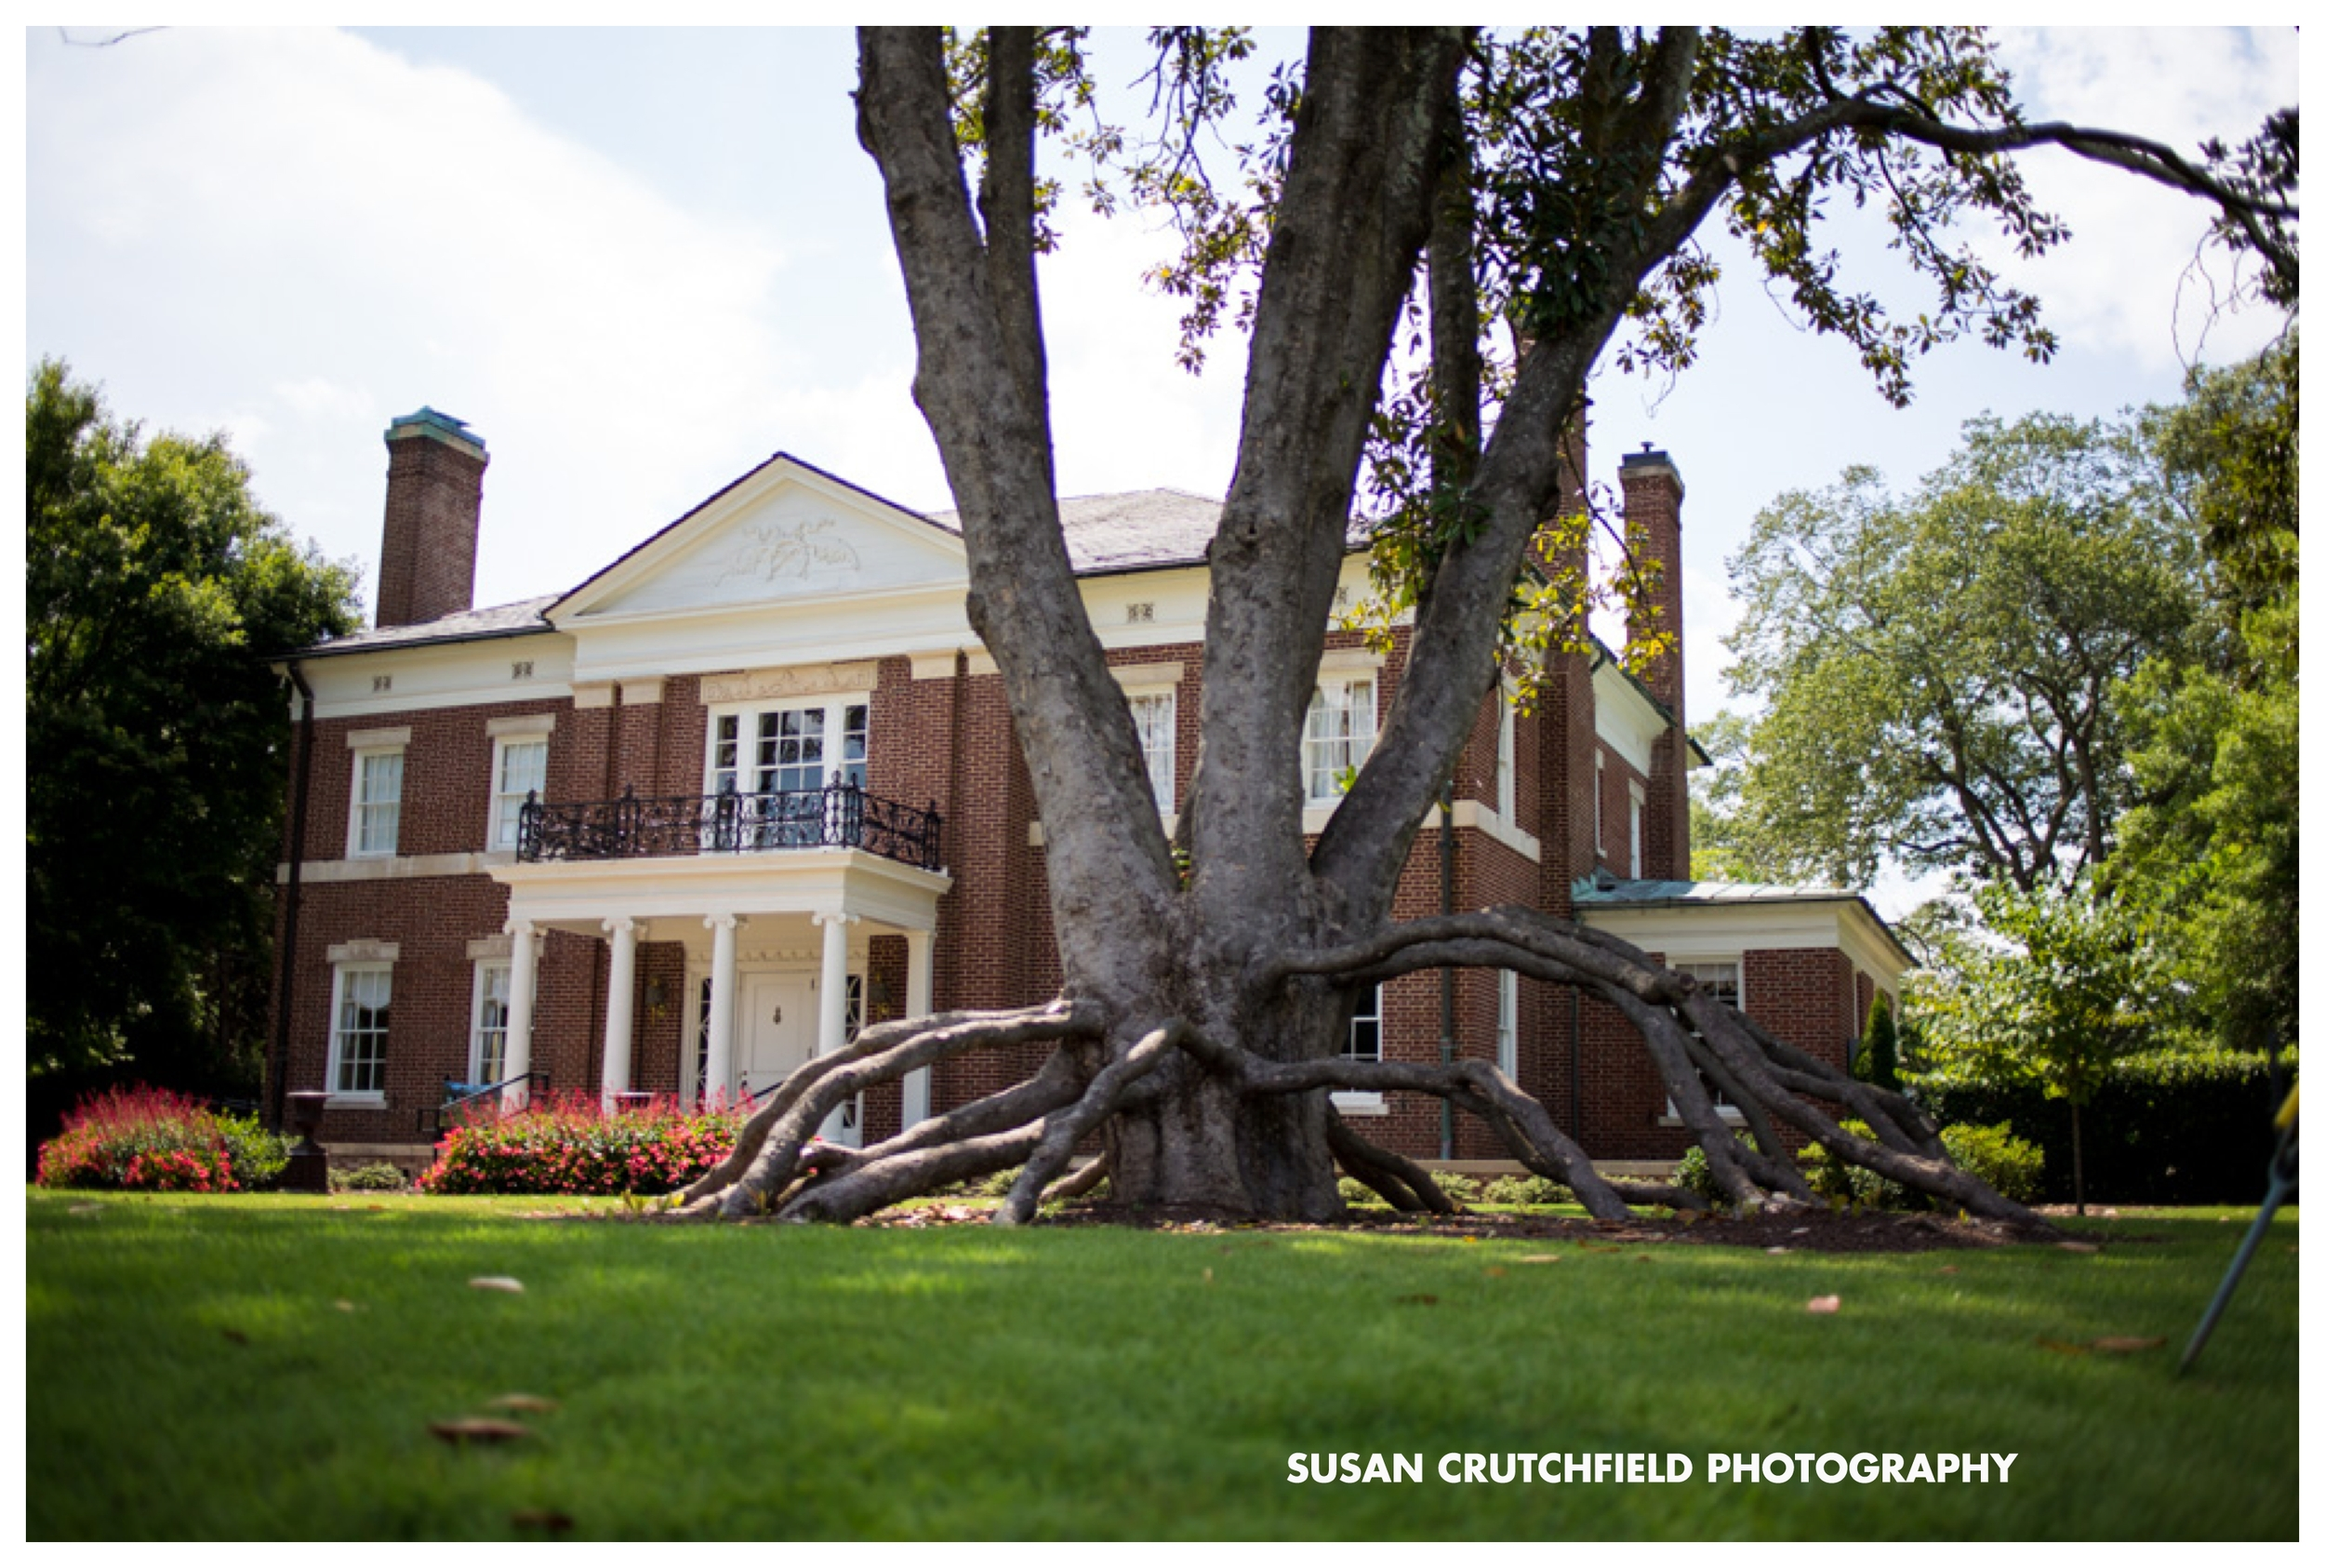 McRitchie-Hollis Museum Newnan, GA © Susan Crutchfield Photography